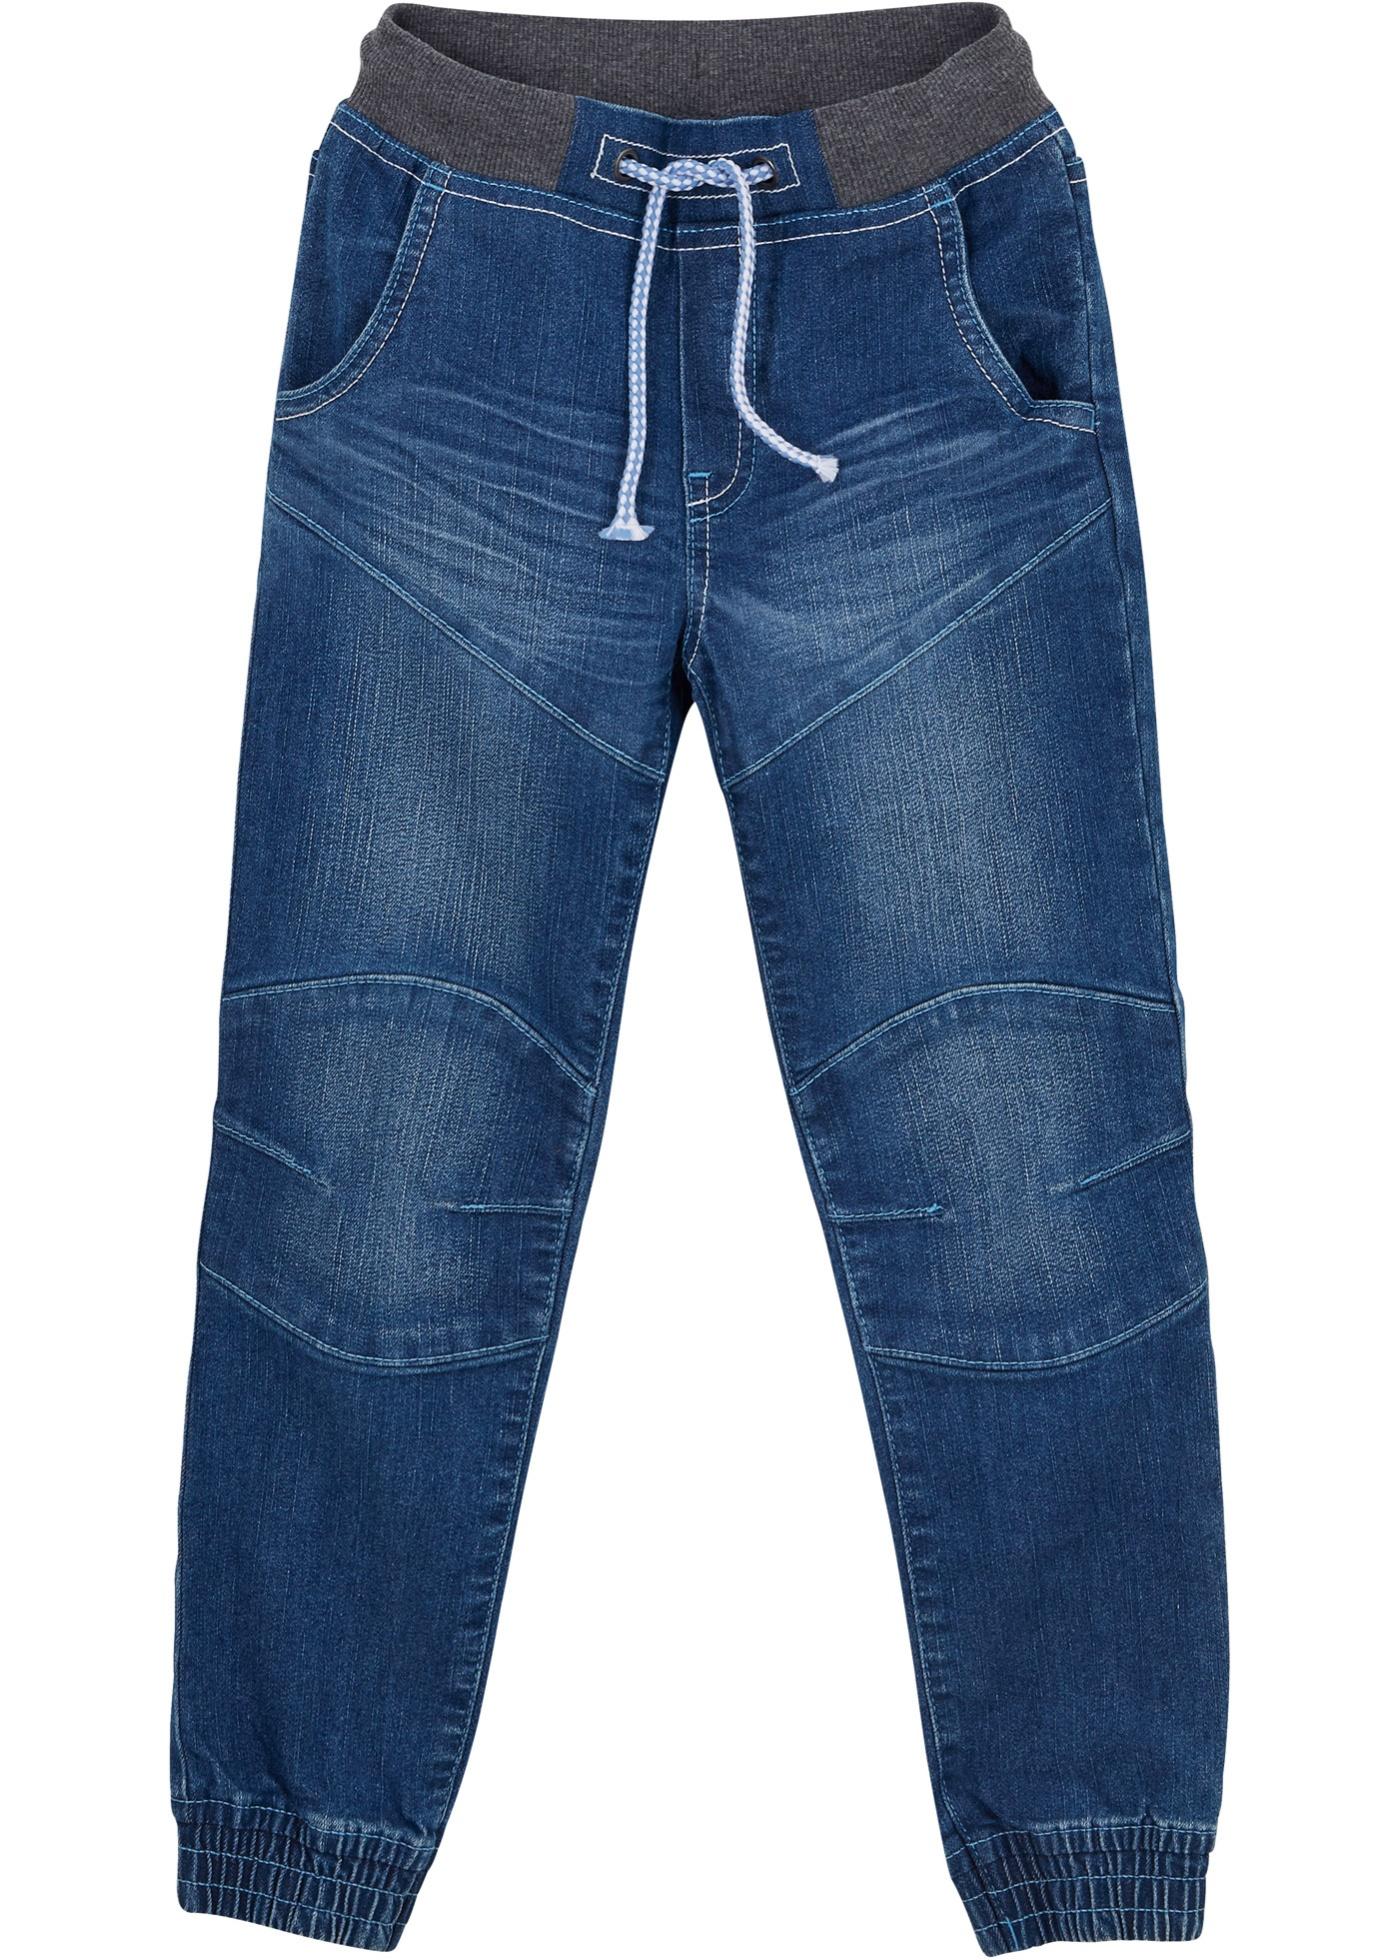 Jungen Jeans, Regular Fit